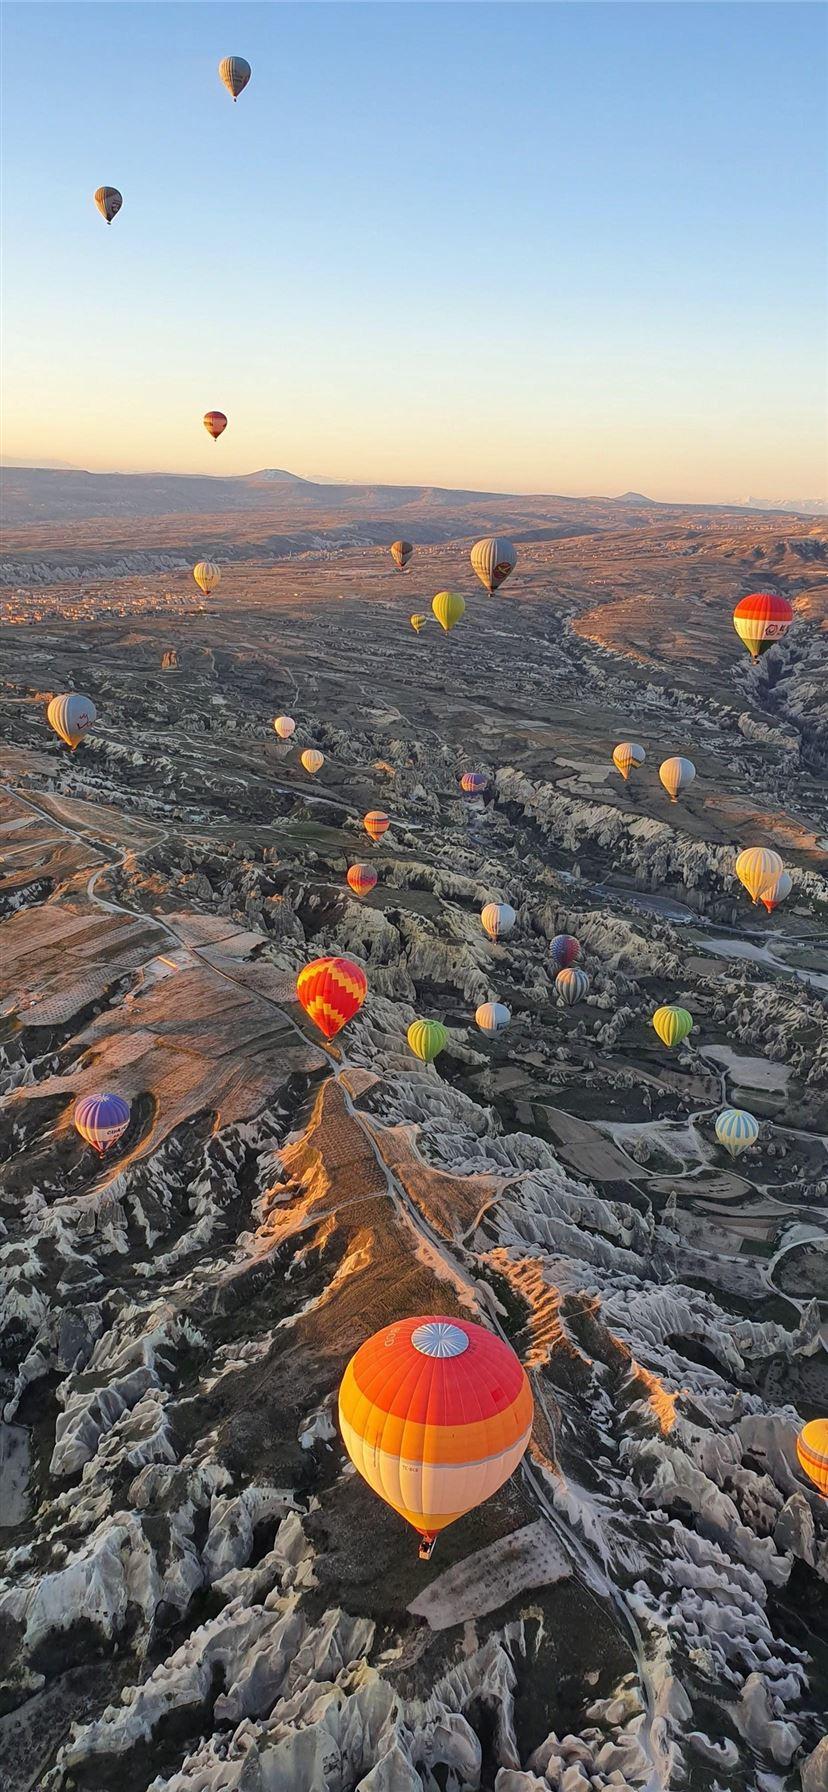 Hot Air Ballooning Taken On S10 Cappadocia Turkey Iphone 11 Wallpapers Free Download